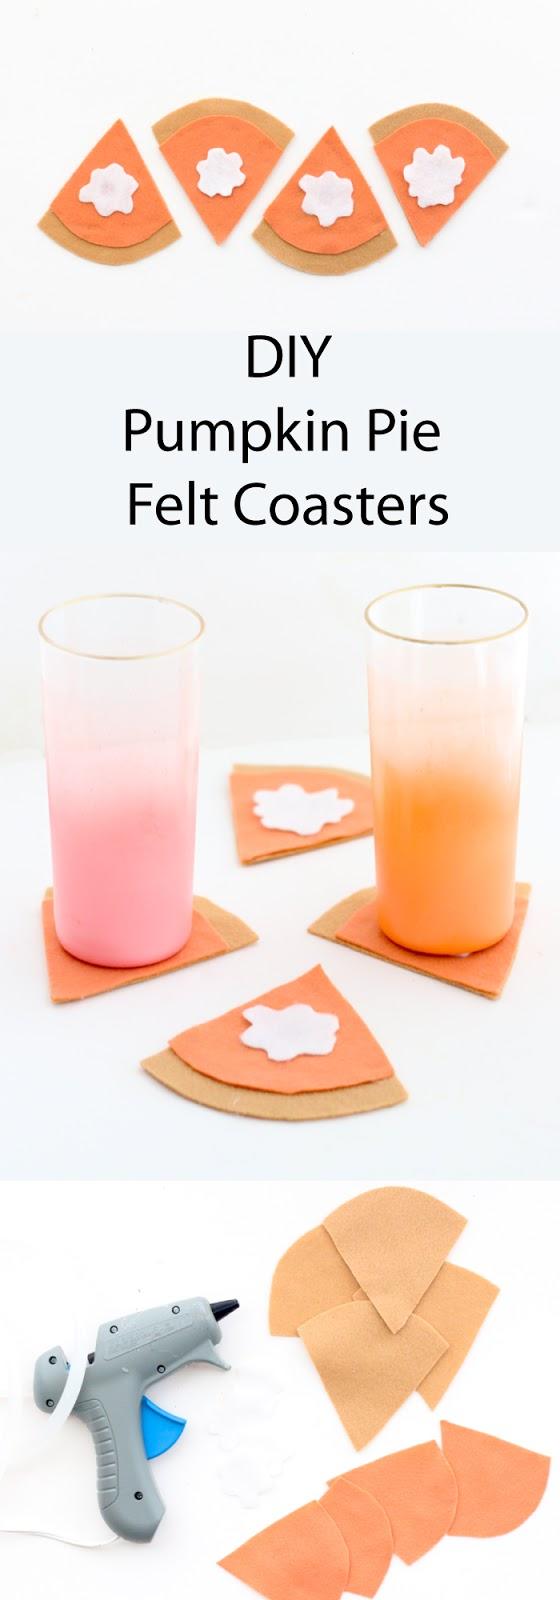 DIY Pumpkin Pie Felt Coasters for Thanksgiving dinner craft idea - easy quick craft - last minute craft - Thanksgiving craft idea